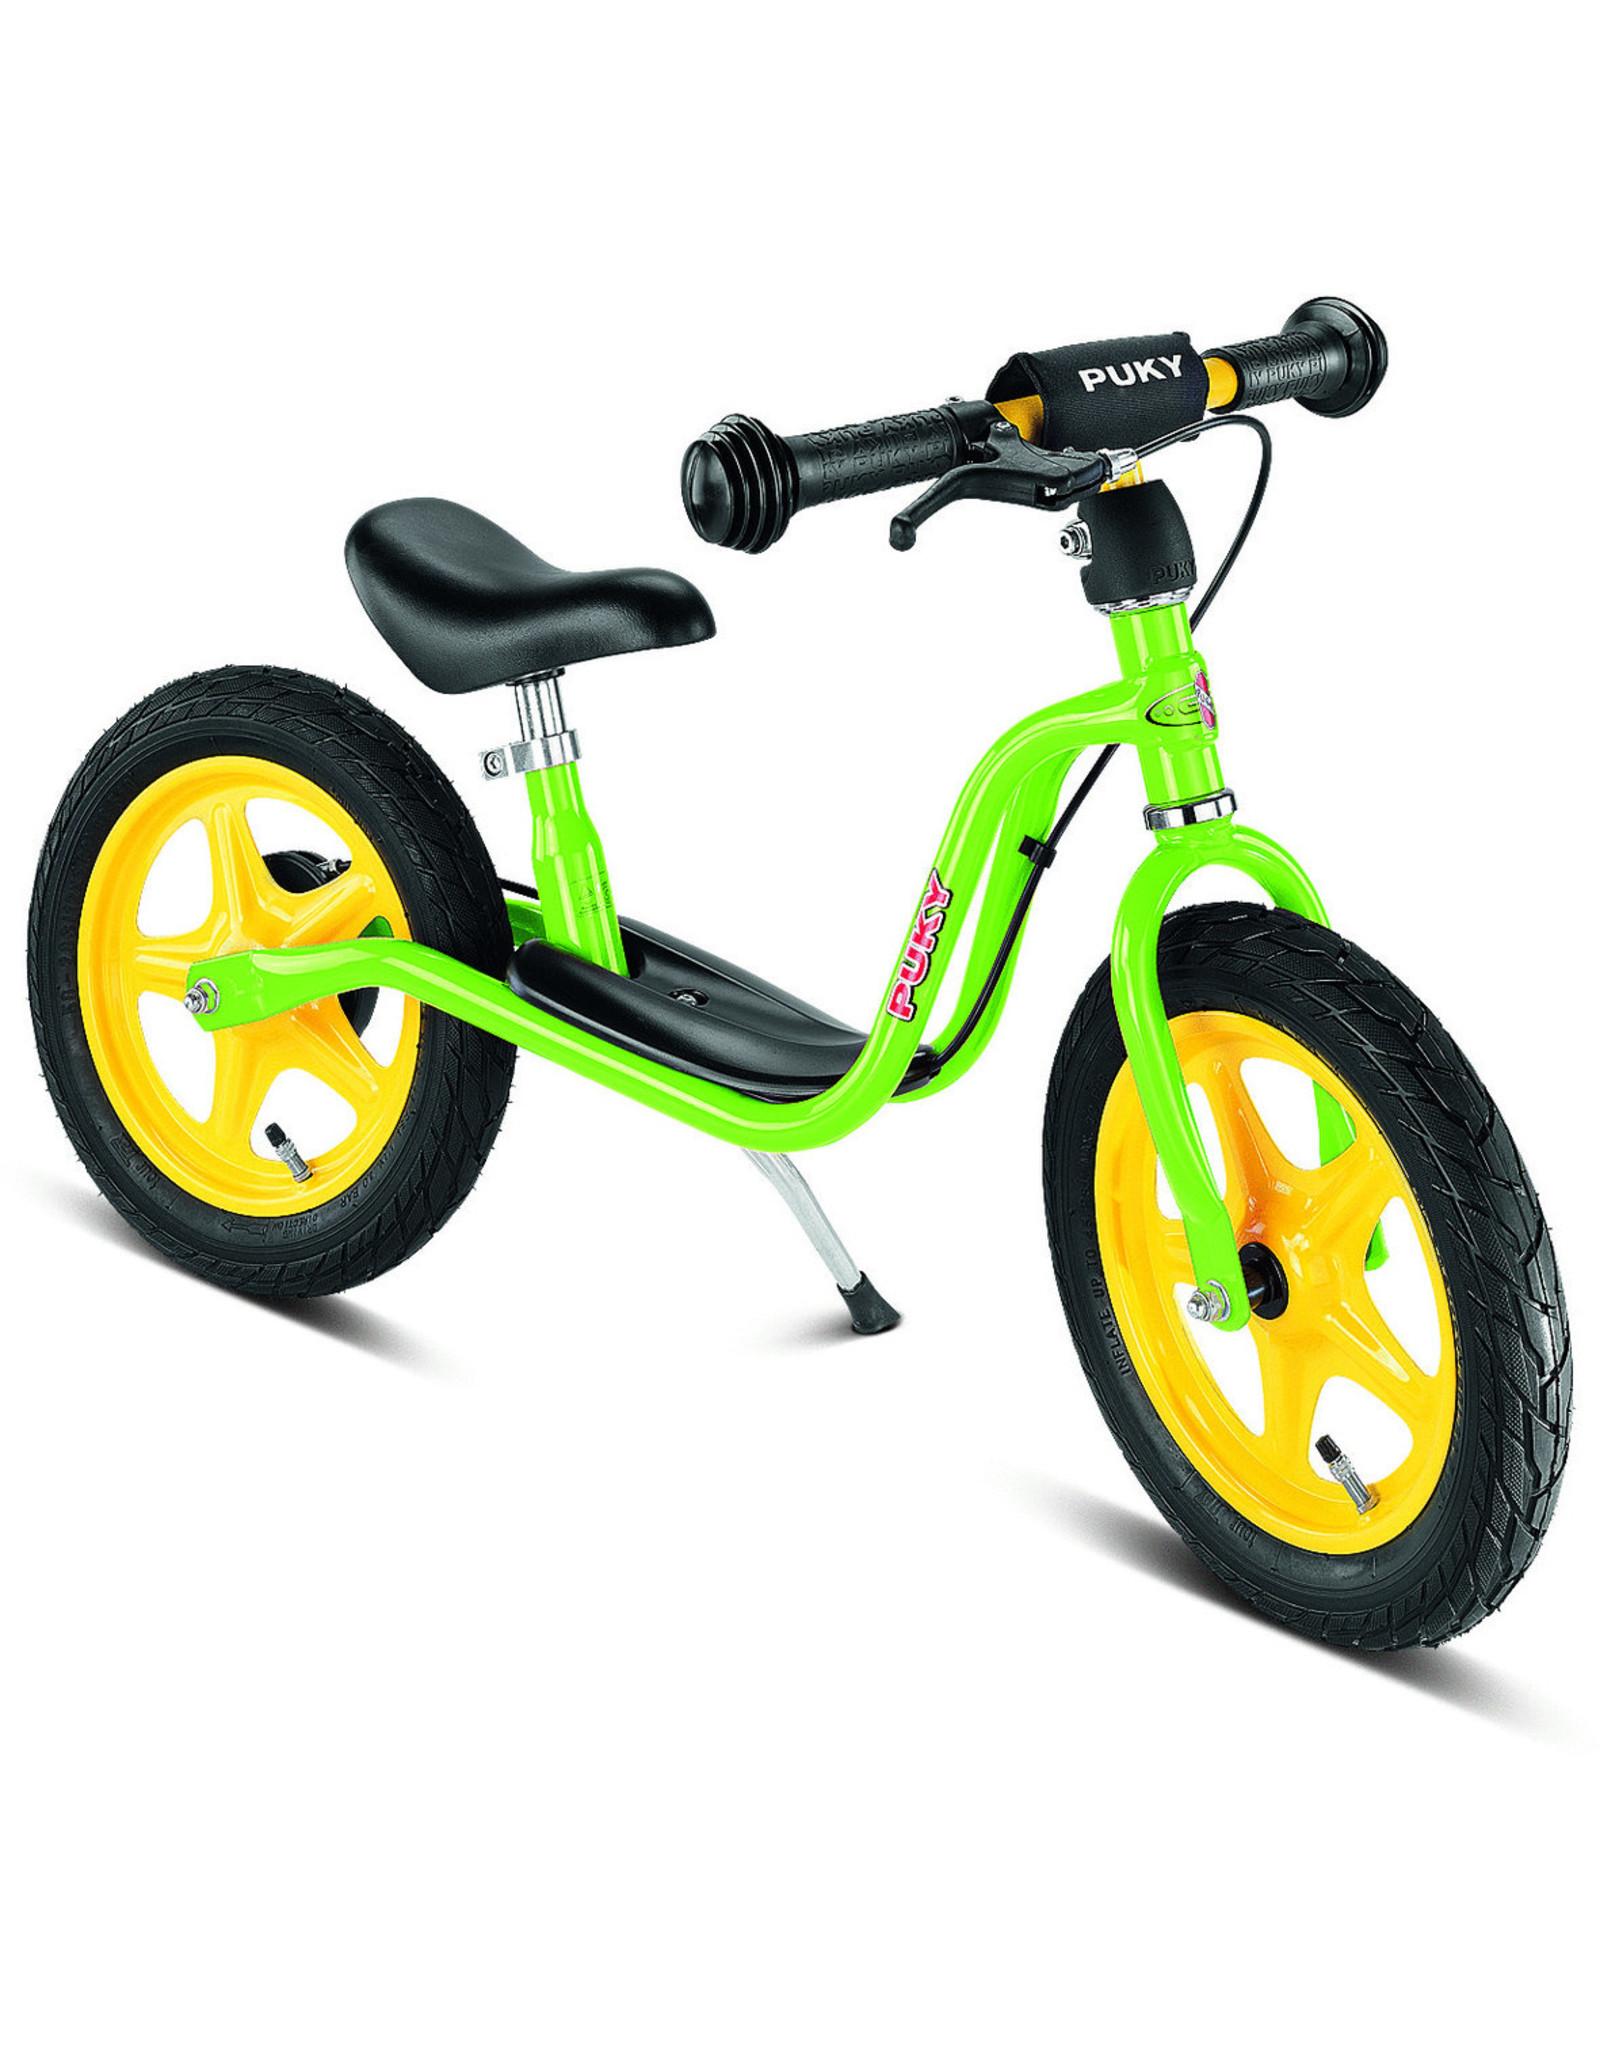 Puky Puky LR1L BR Balance Bike Green - Altoys - toys and more